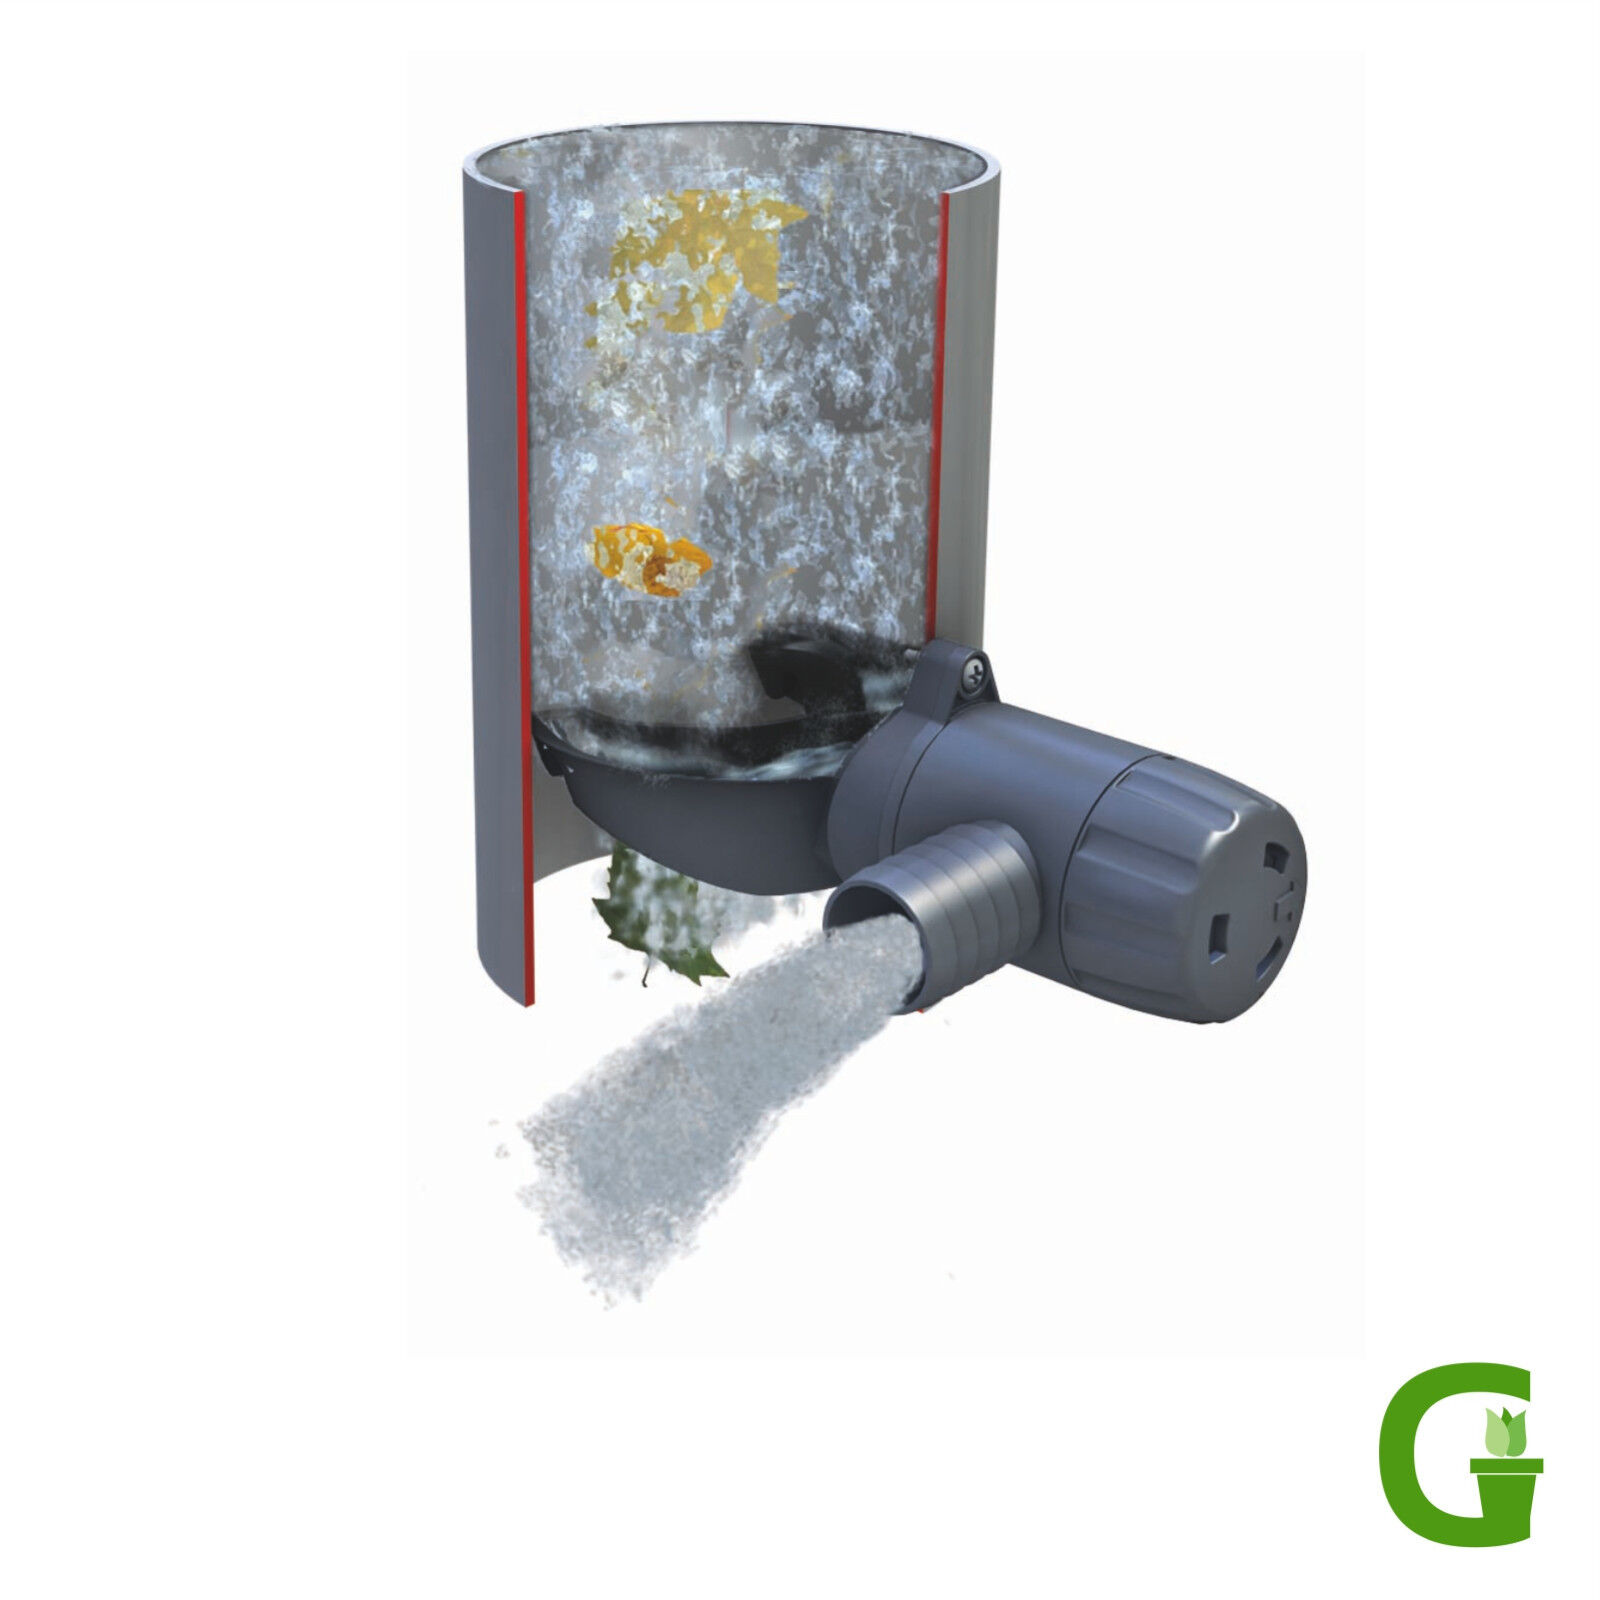 Graf Garantia Rapido Regensammler Füllautomat - Installiert in 5 Minuten!